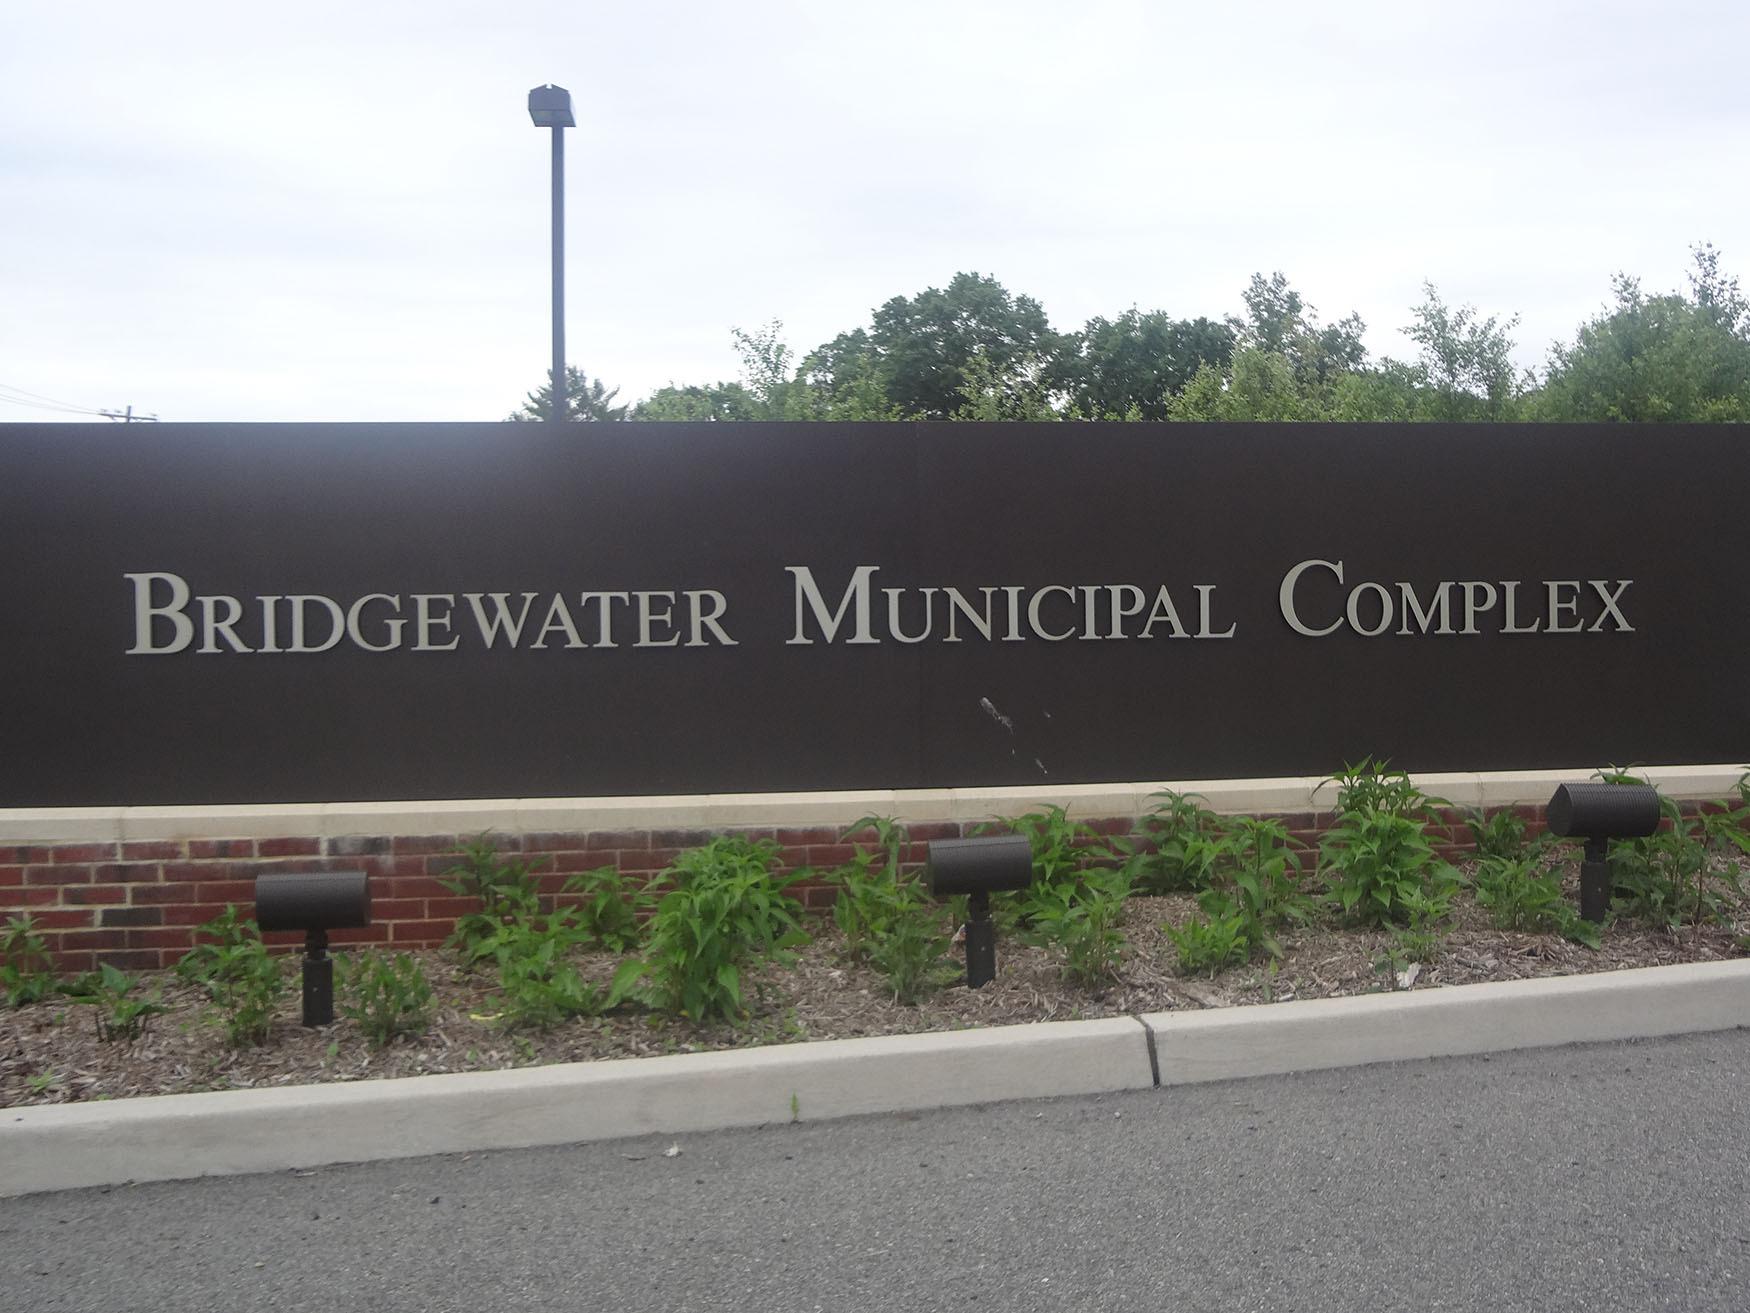 bb9c8f7039a3fdce7560_Bridgewater_municipal.jpg